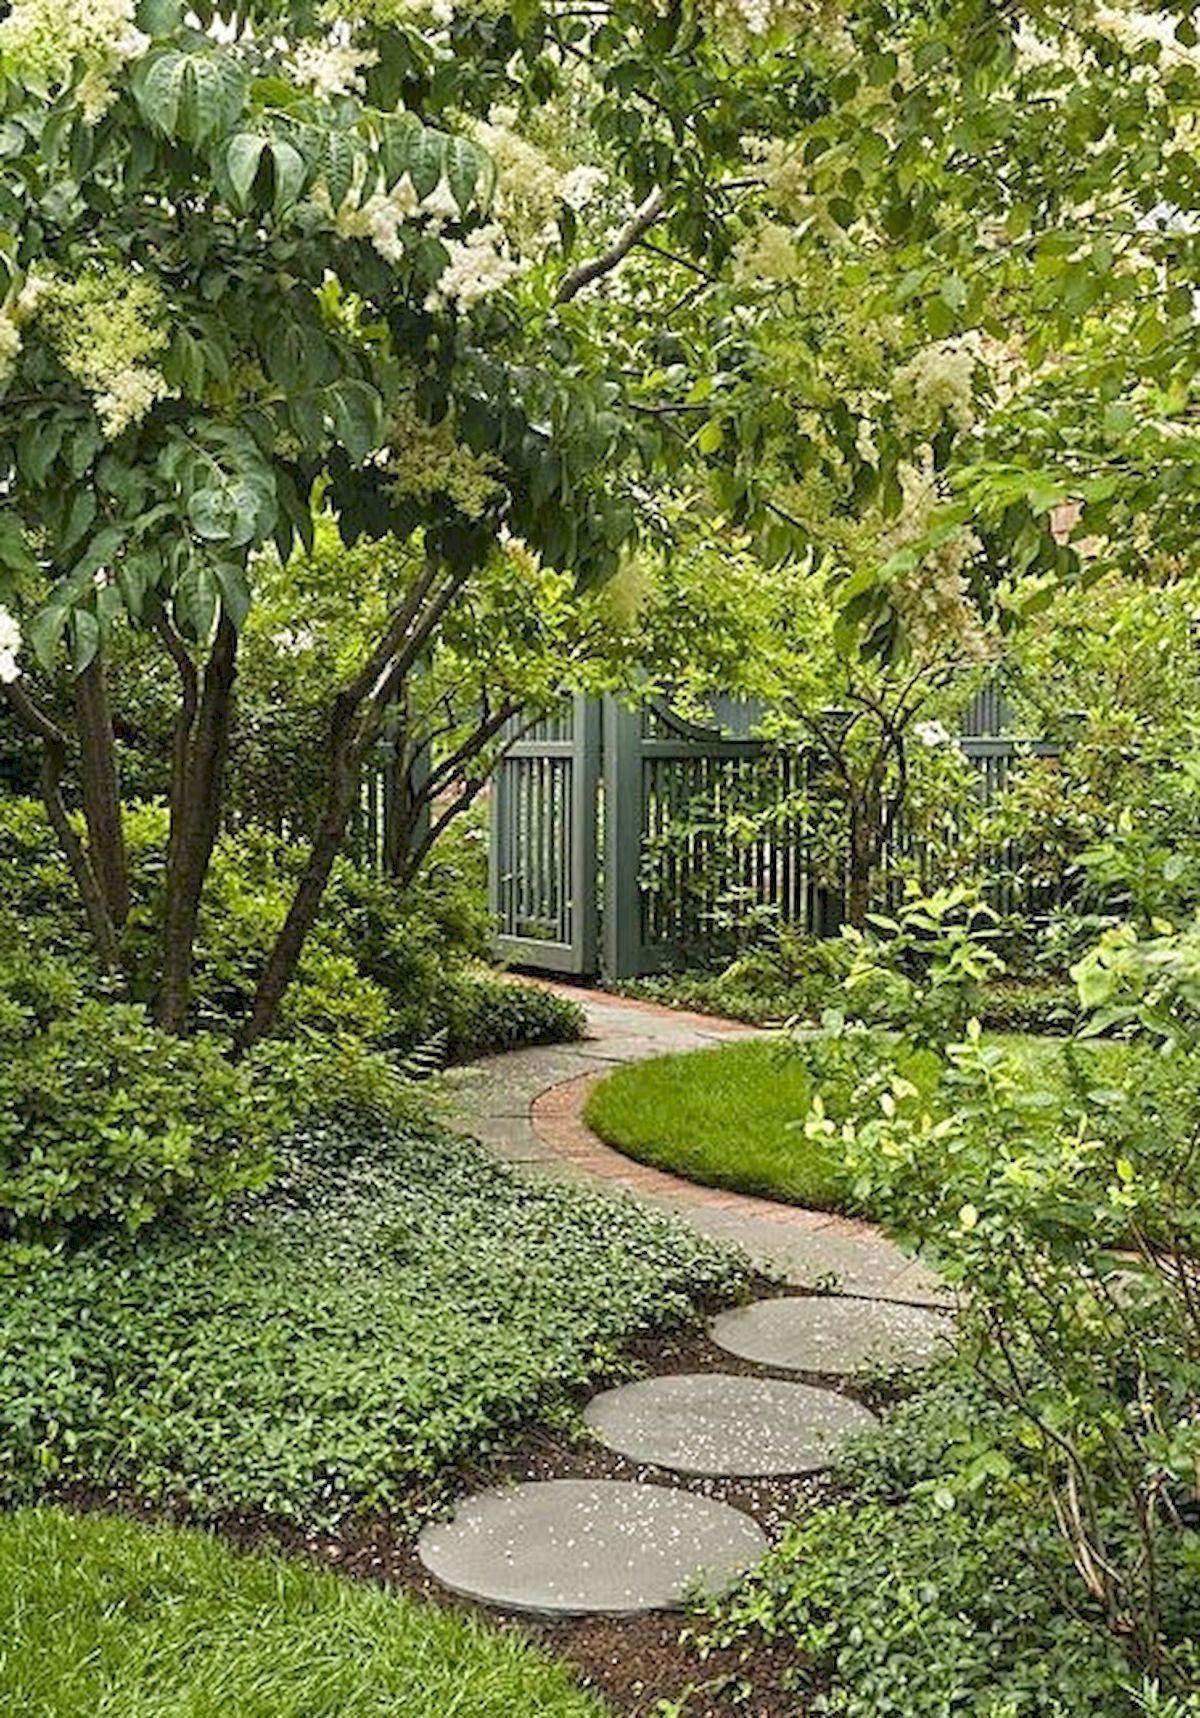 77 Favourite Pinterest Garden Decor Ideas 10 In 2020 Small